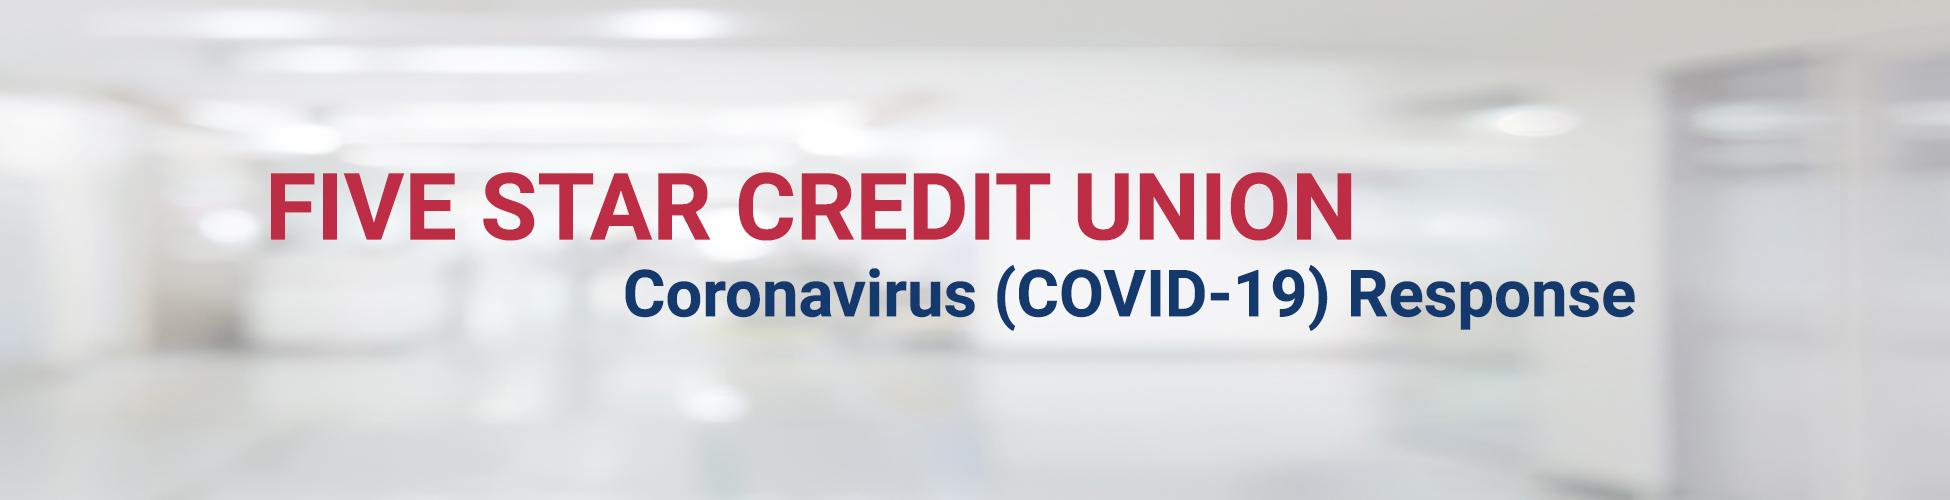 FSCU-20501_CoronaVirusPgHeader_V2